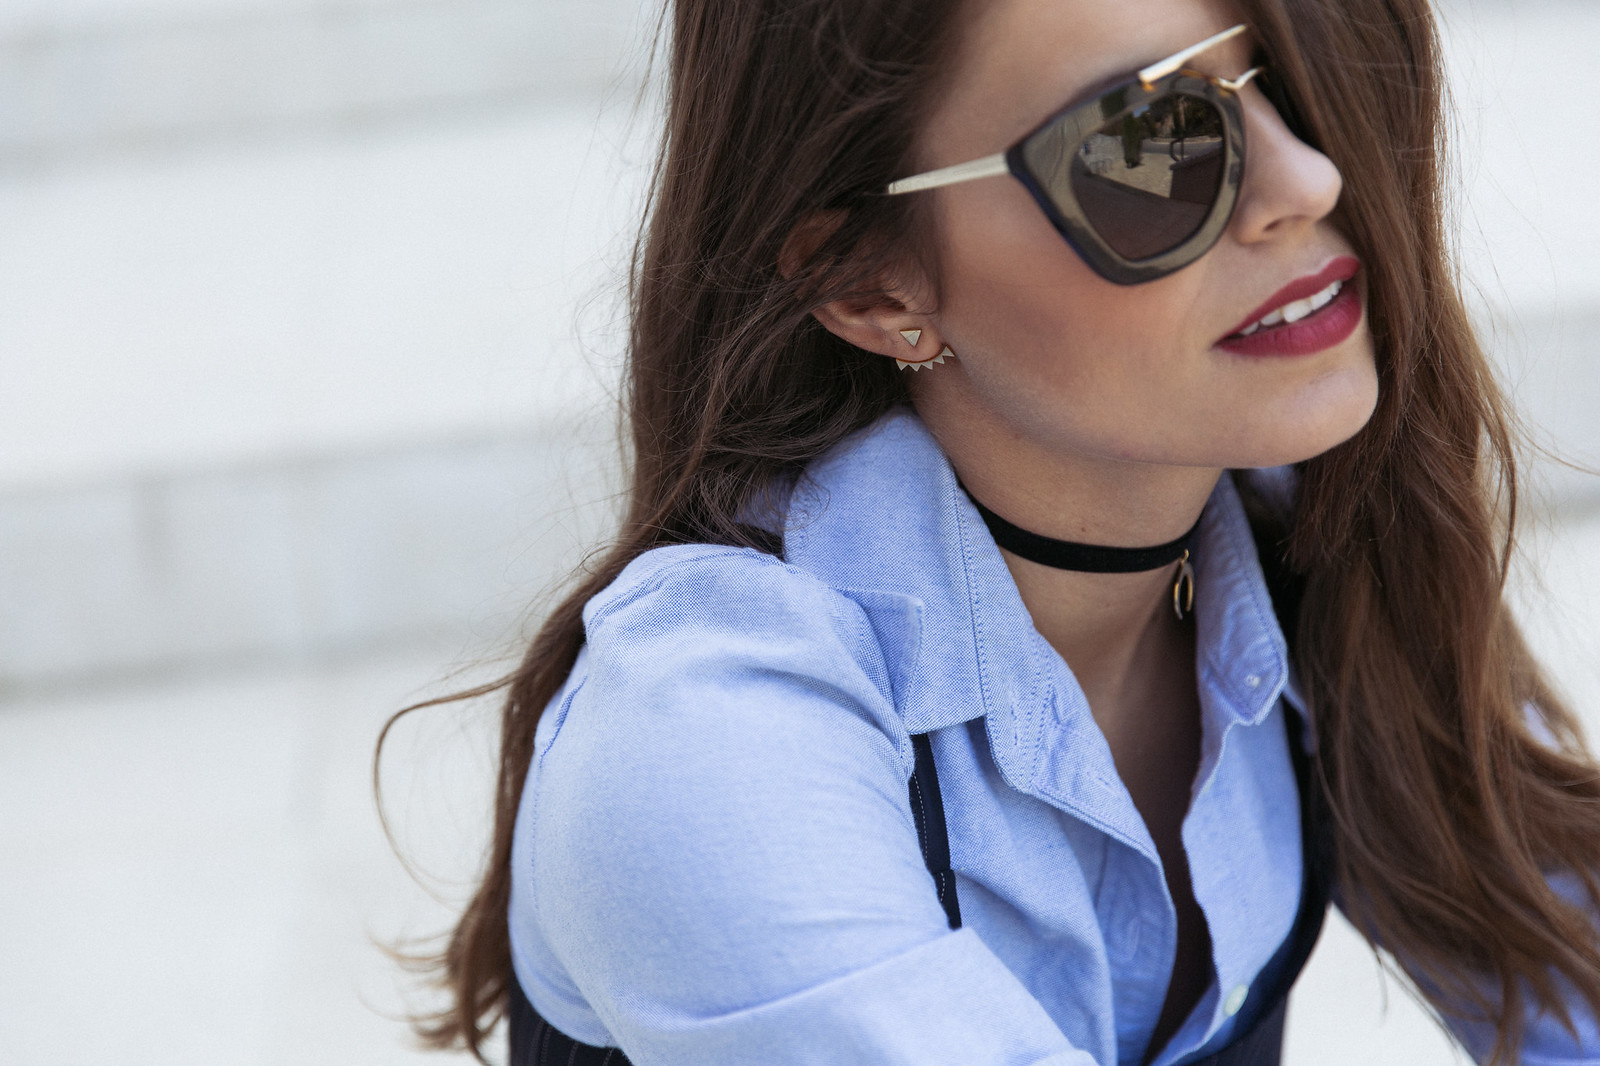 Jessie Chanes Seams for a desire - Pinstripped suit topshop heeled sandals schutz parfois bag  -9